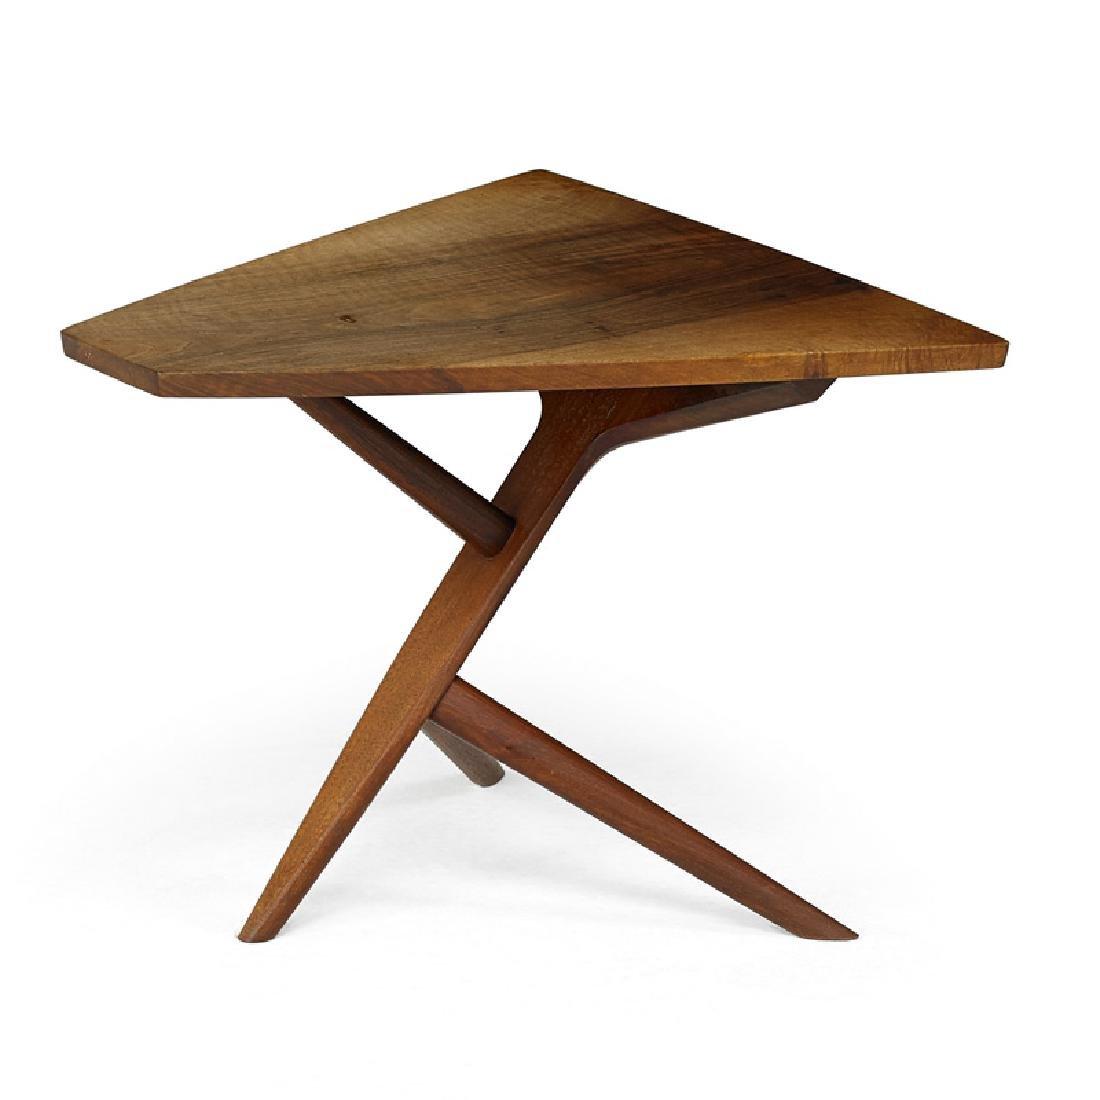 GEORGE NAKASHIMA Cross-legged side table